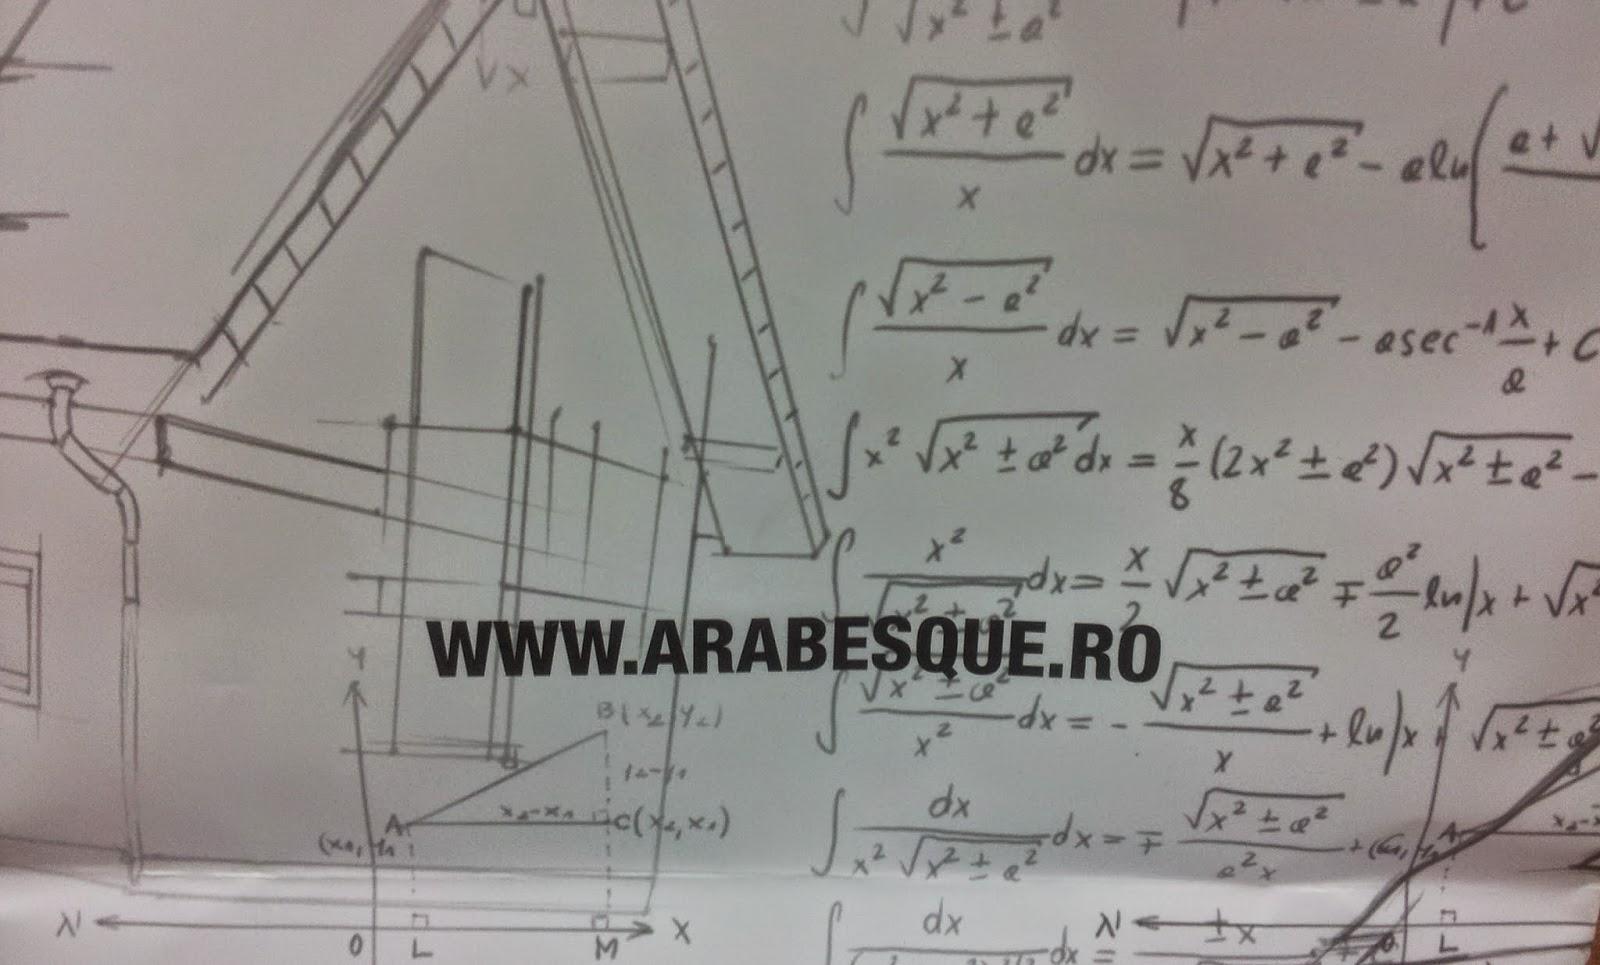 Arabesque - cand construiesc